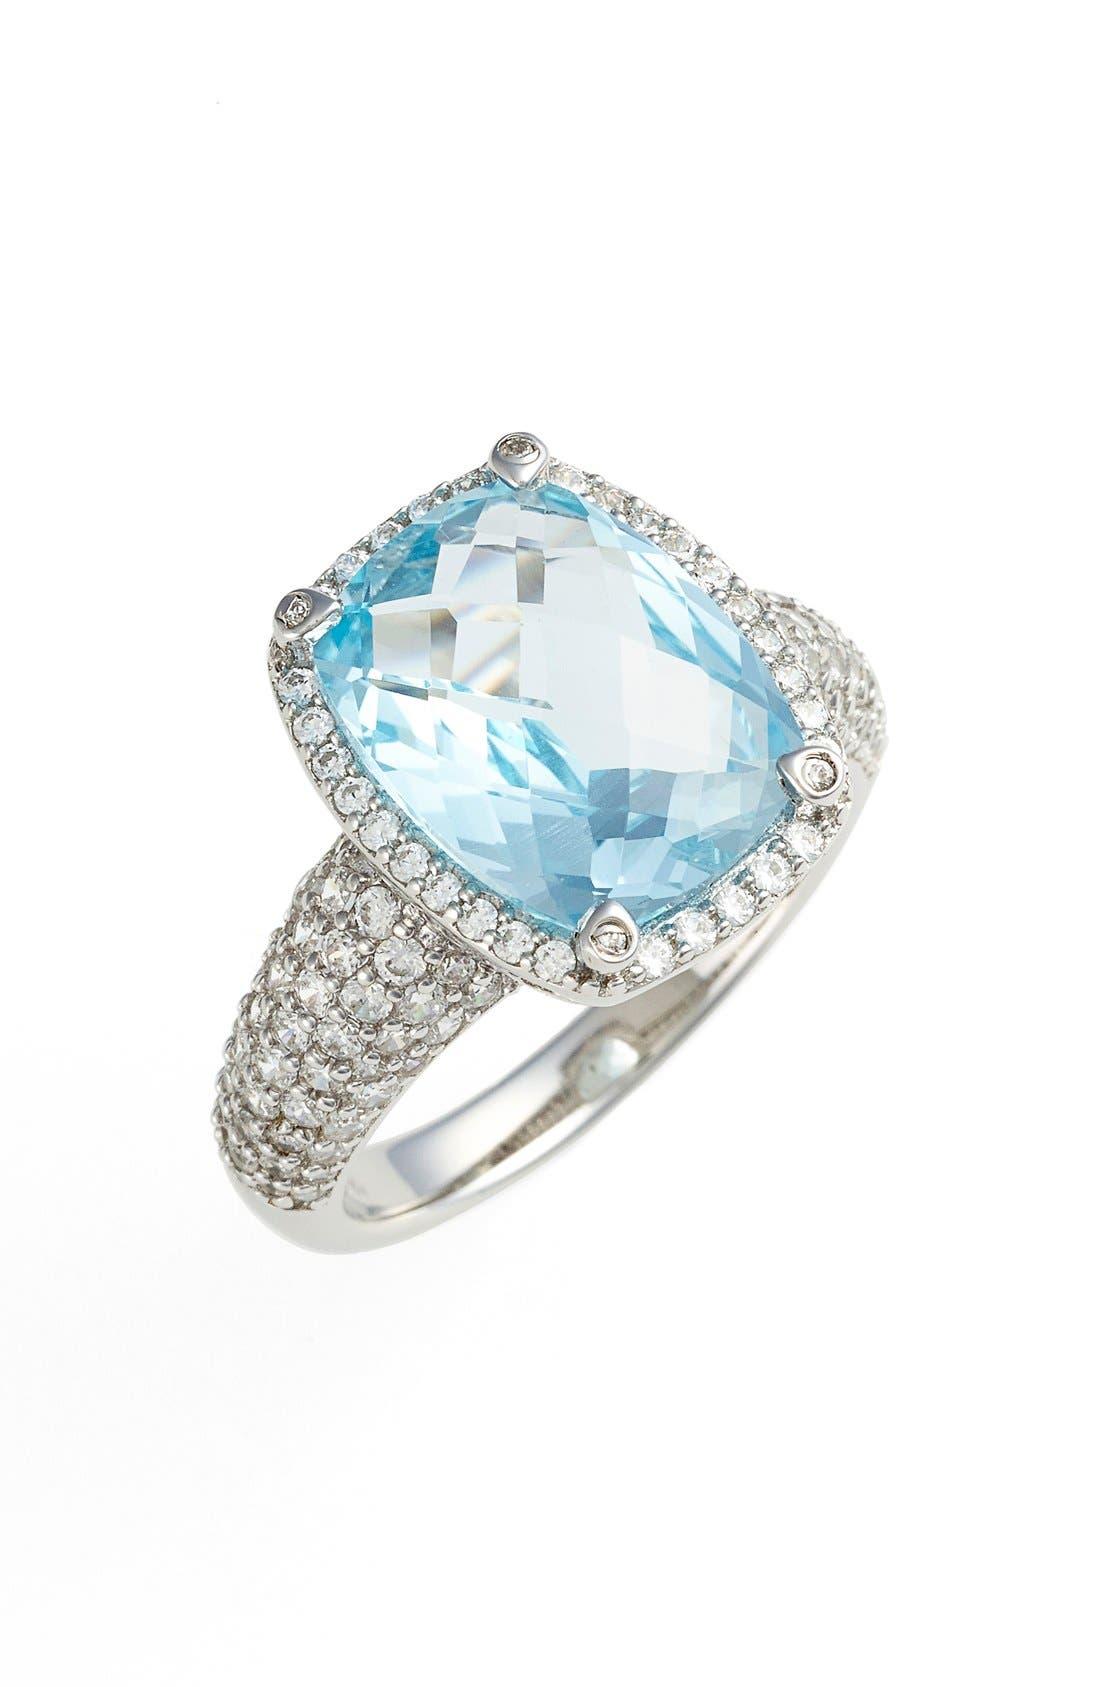 Main Image - Lafonn'Aria' Rectangle Cushion Cut Ring